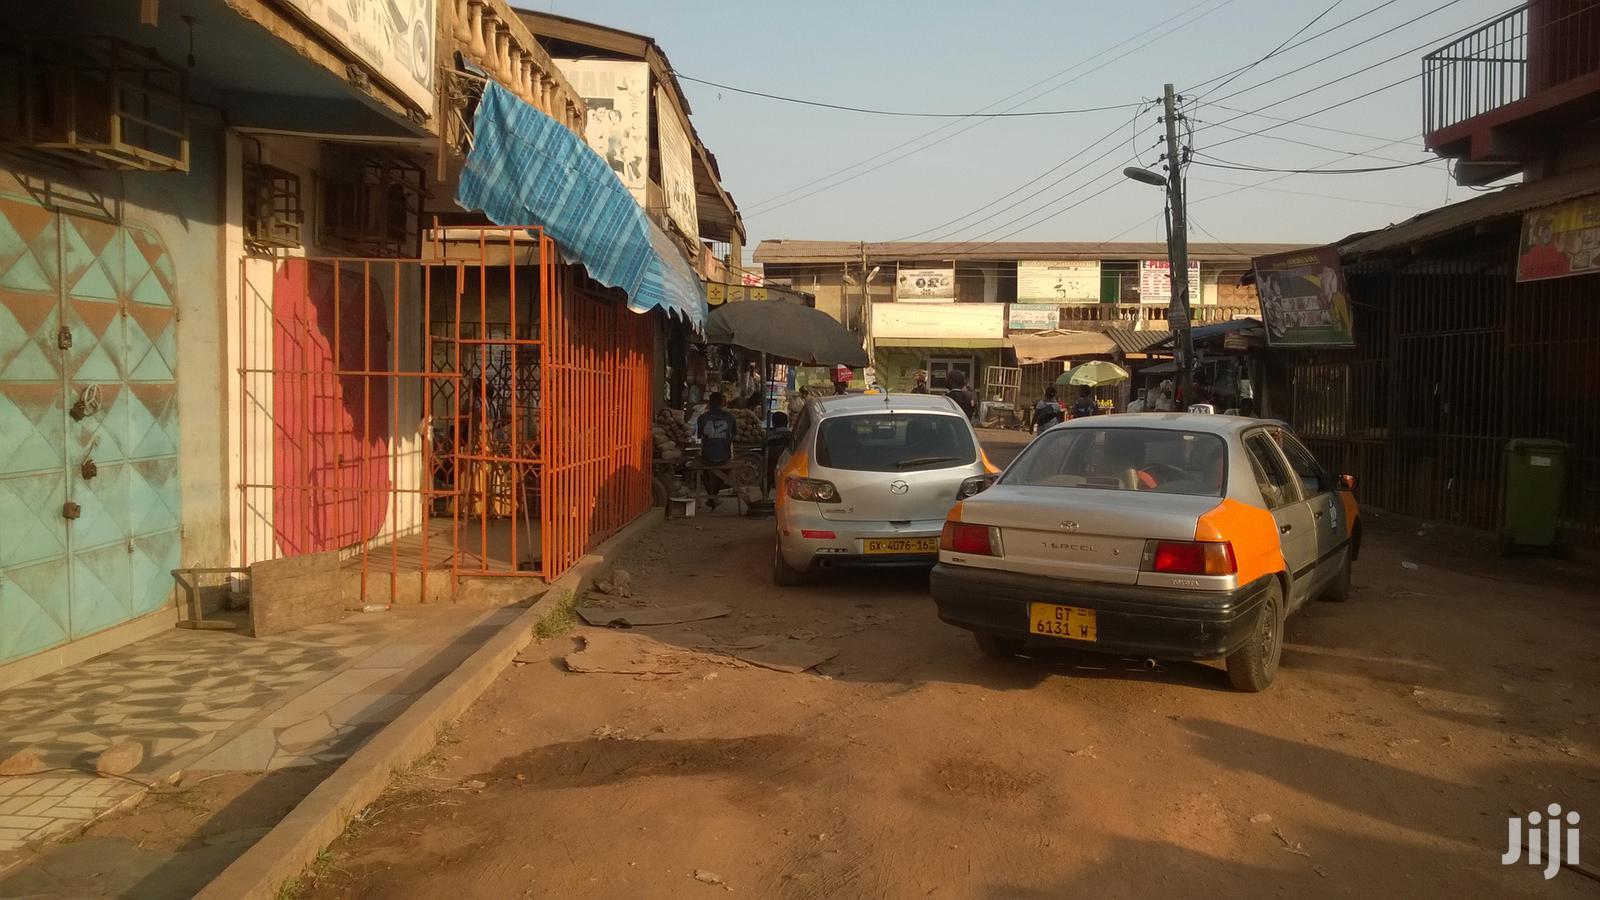 Archive: Nungua Market, NUNGUA: Double Shop Space (On Ground Floor)